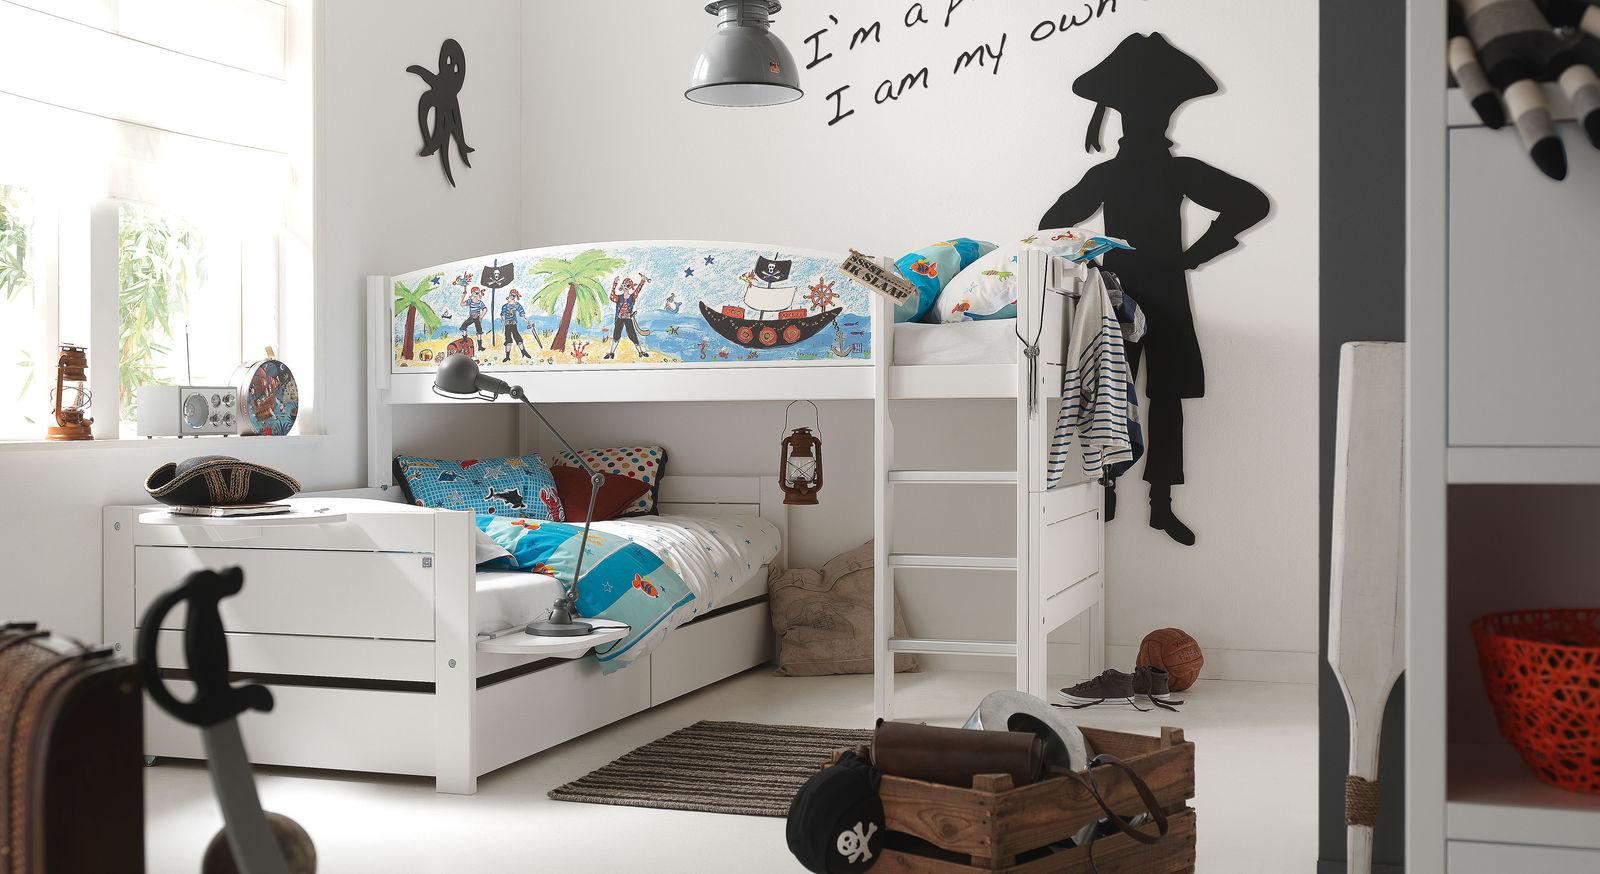 Komplettes Zimmer mit stabilem LIFETIME Eck-Etagenbett Pirat